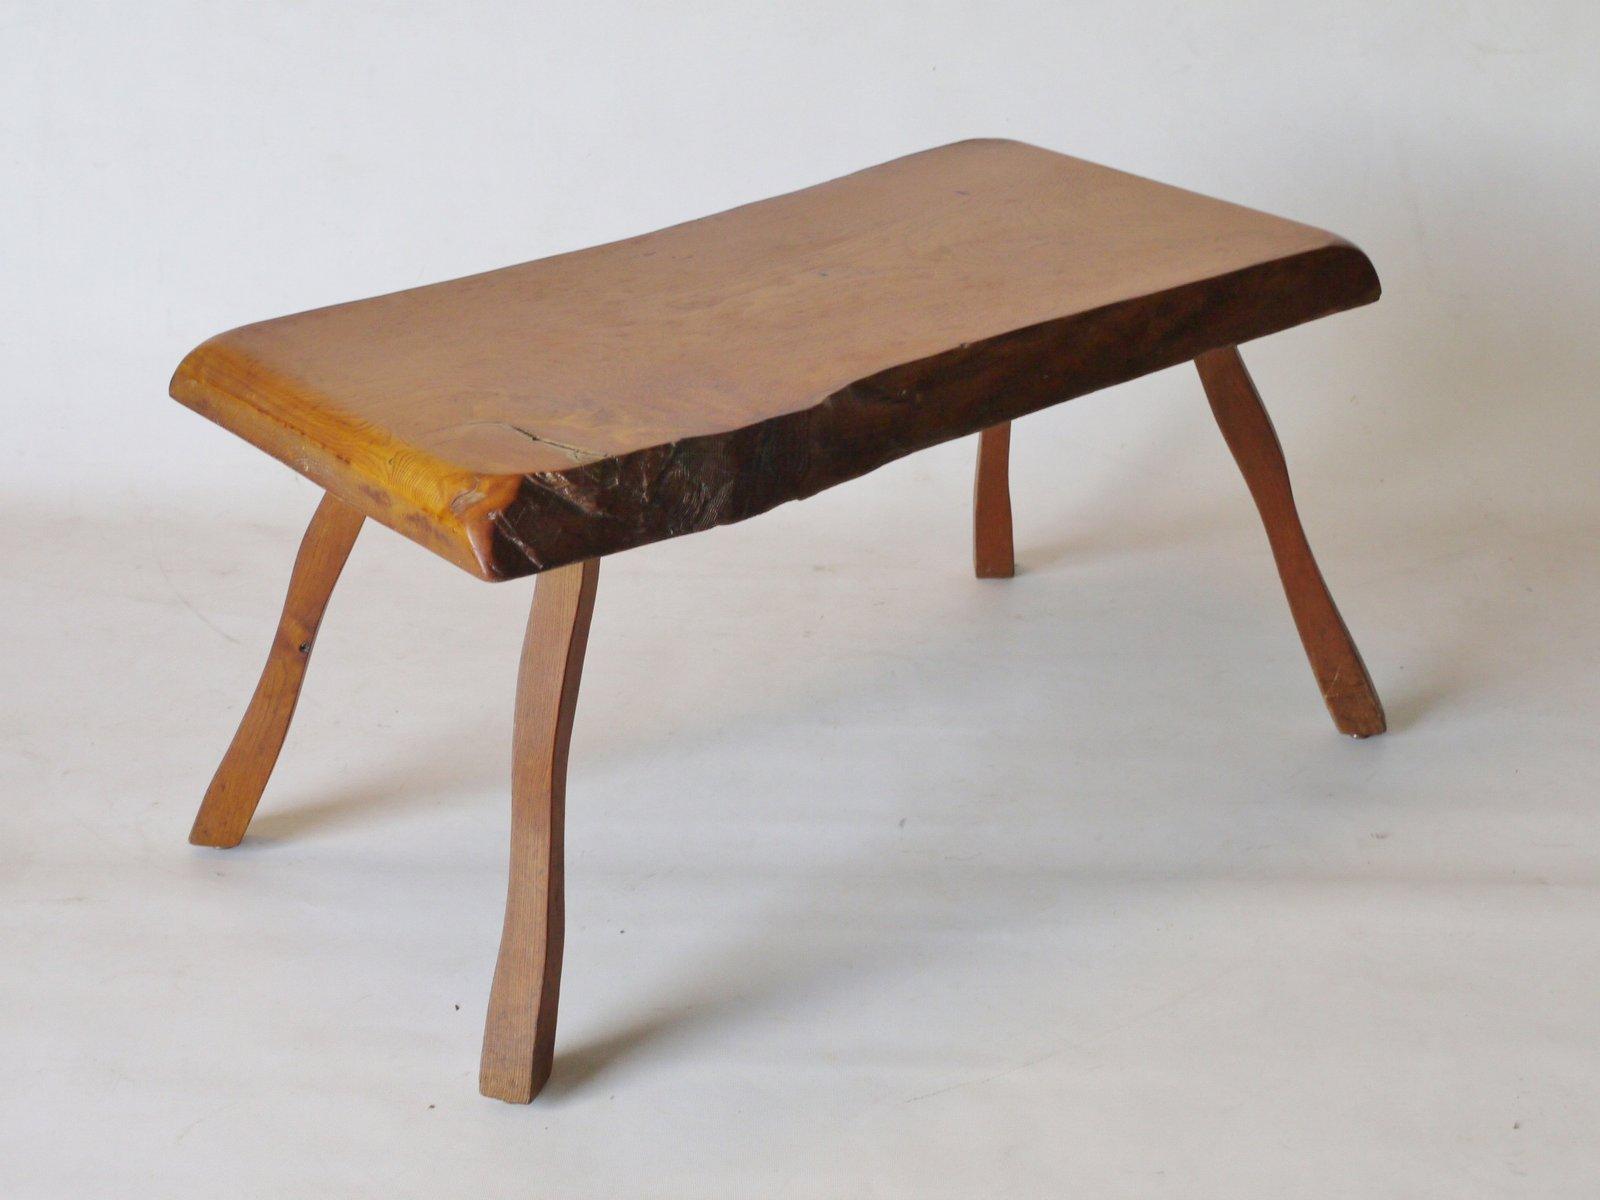 table vintage pays bas 1950 set de 2 en vente sur pamono. Black Bedroom Furniture Sets. Home Design Ideas